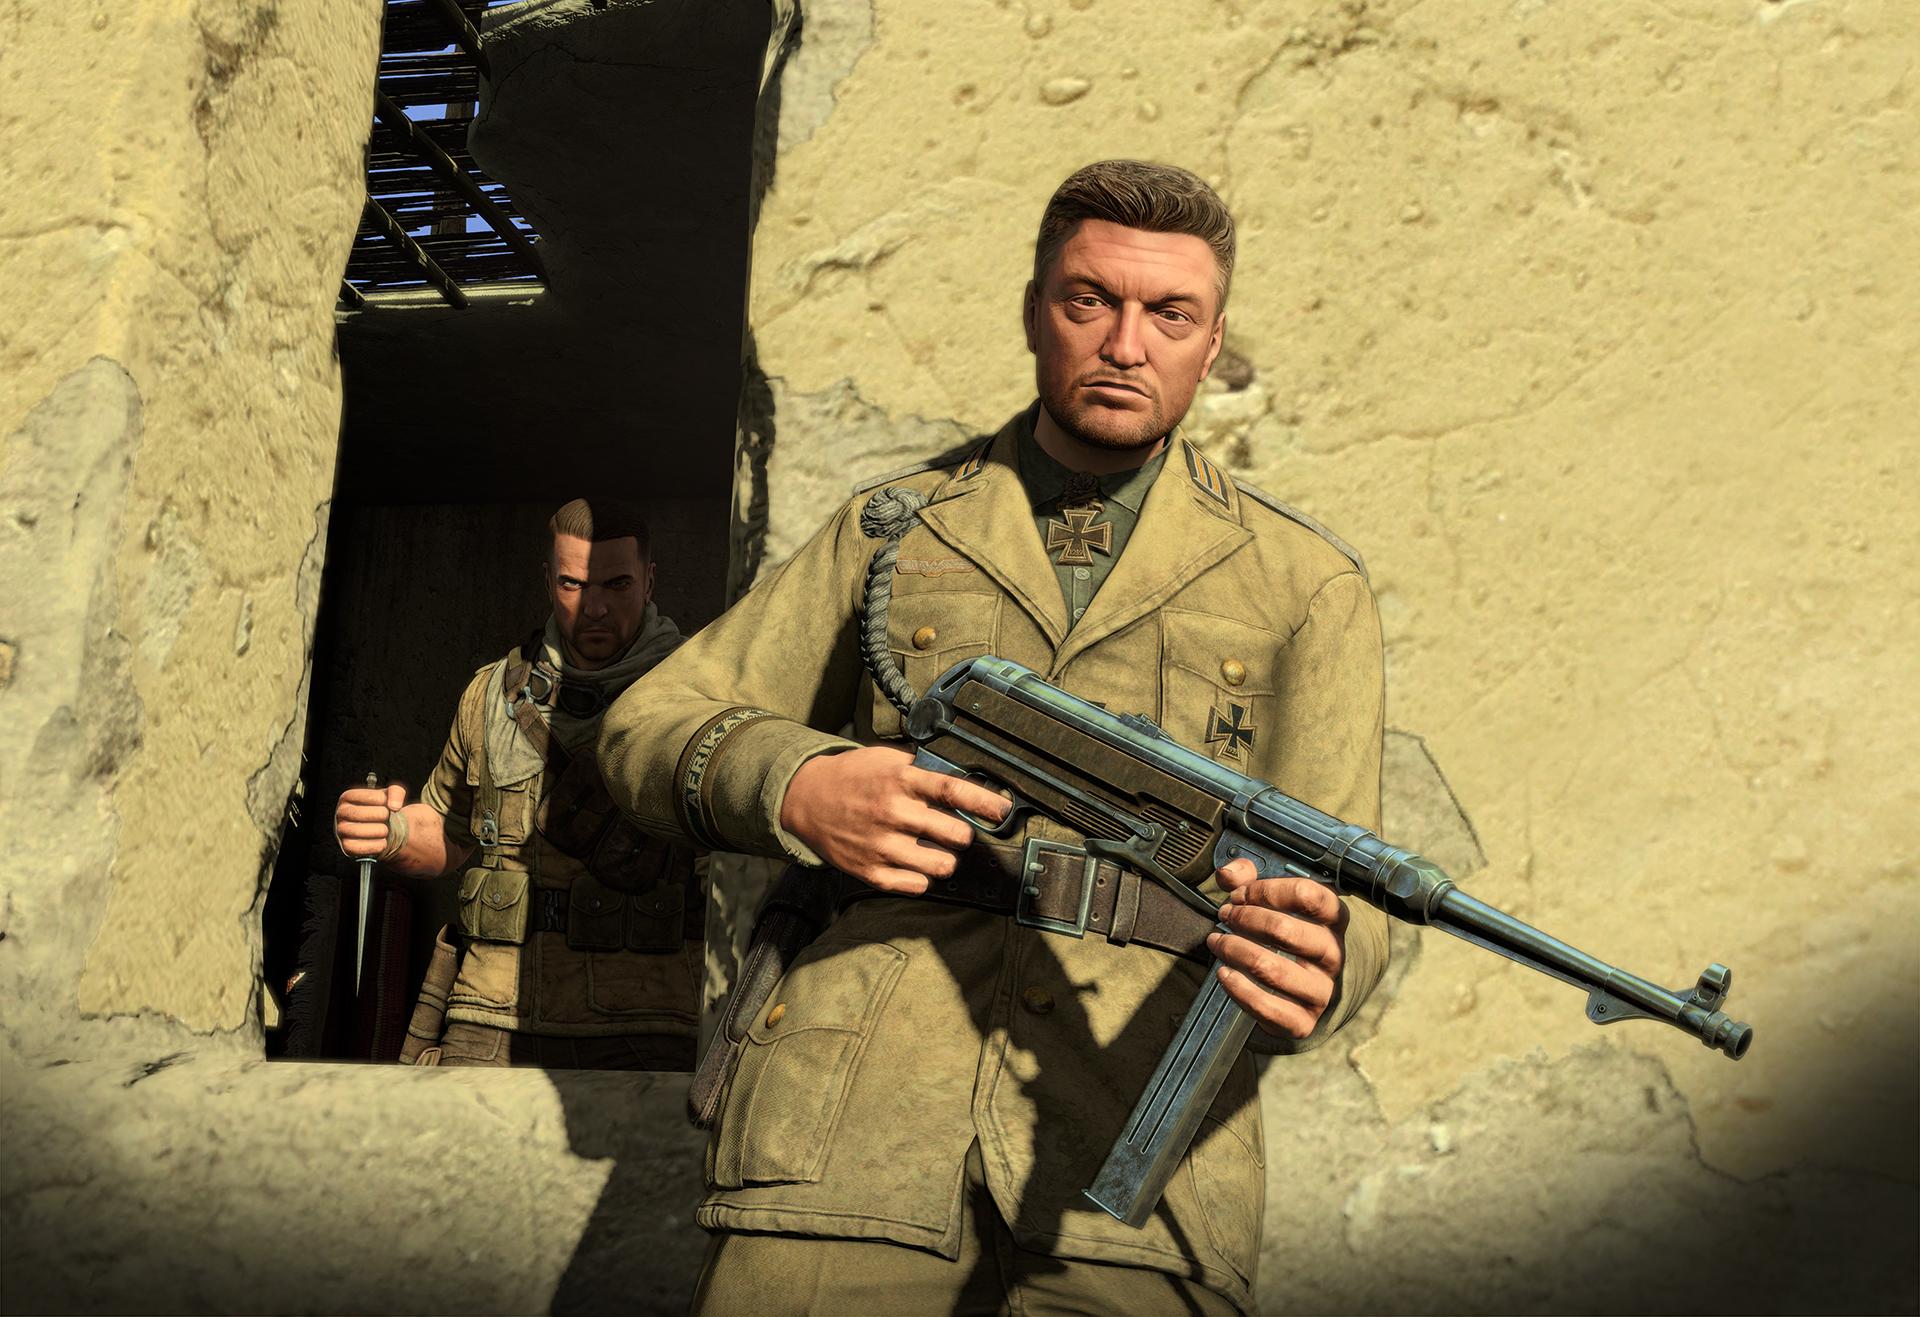 Kill Charlie Brooker Sniper Elite 3